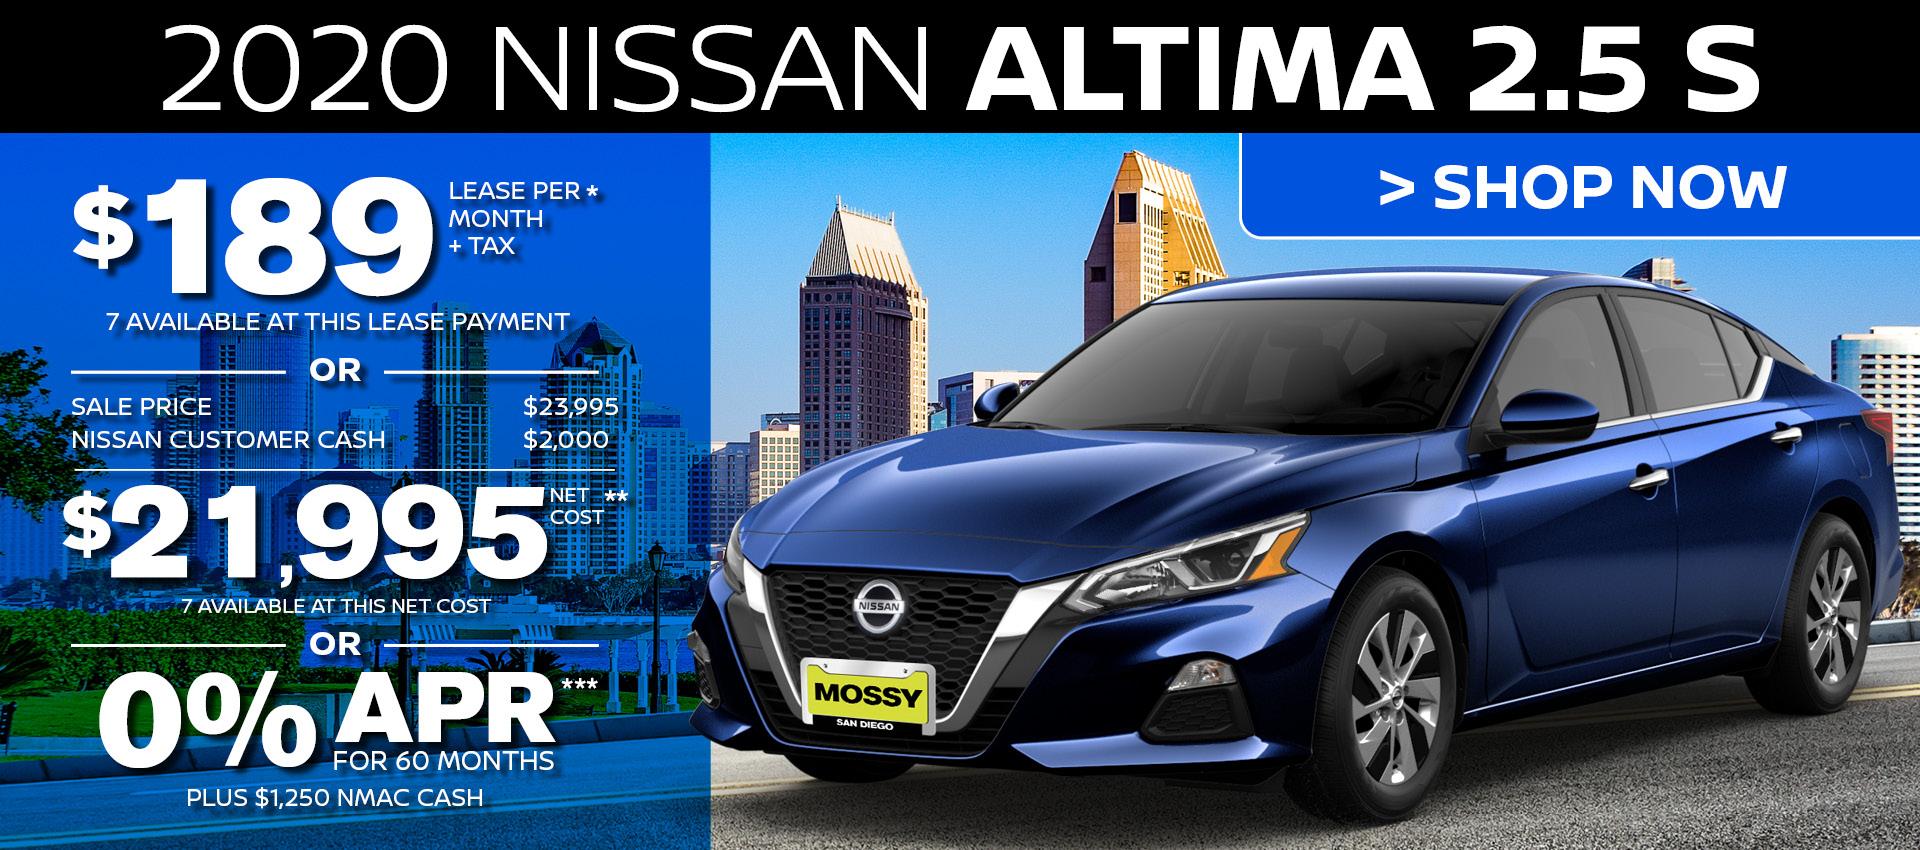 Mossy Nissan - Altima HP